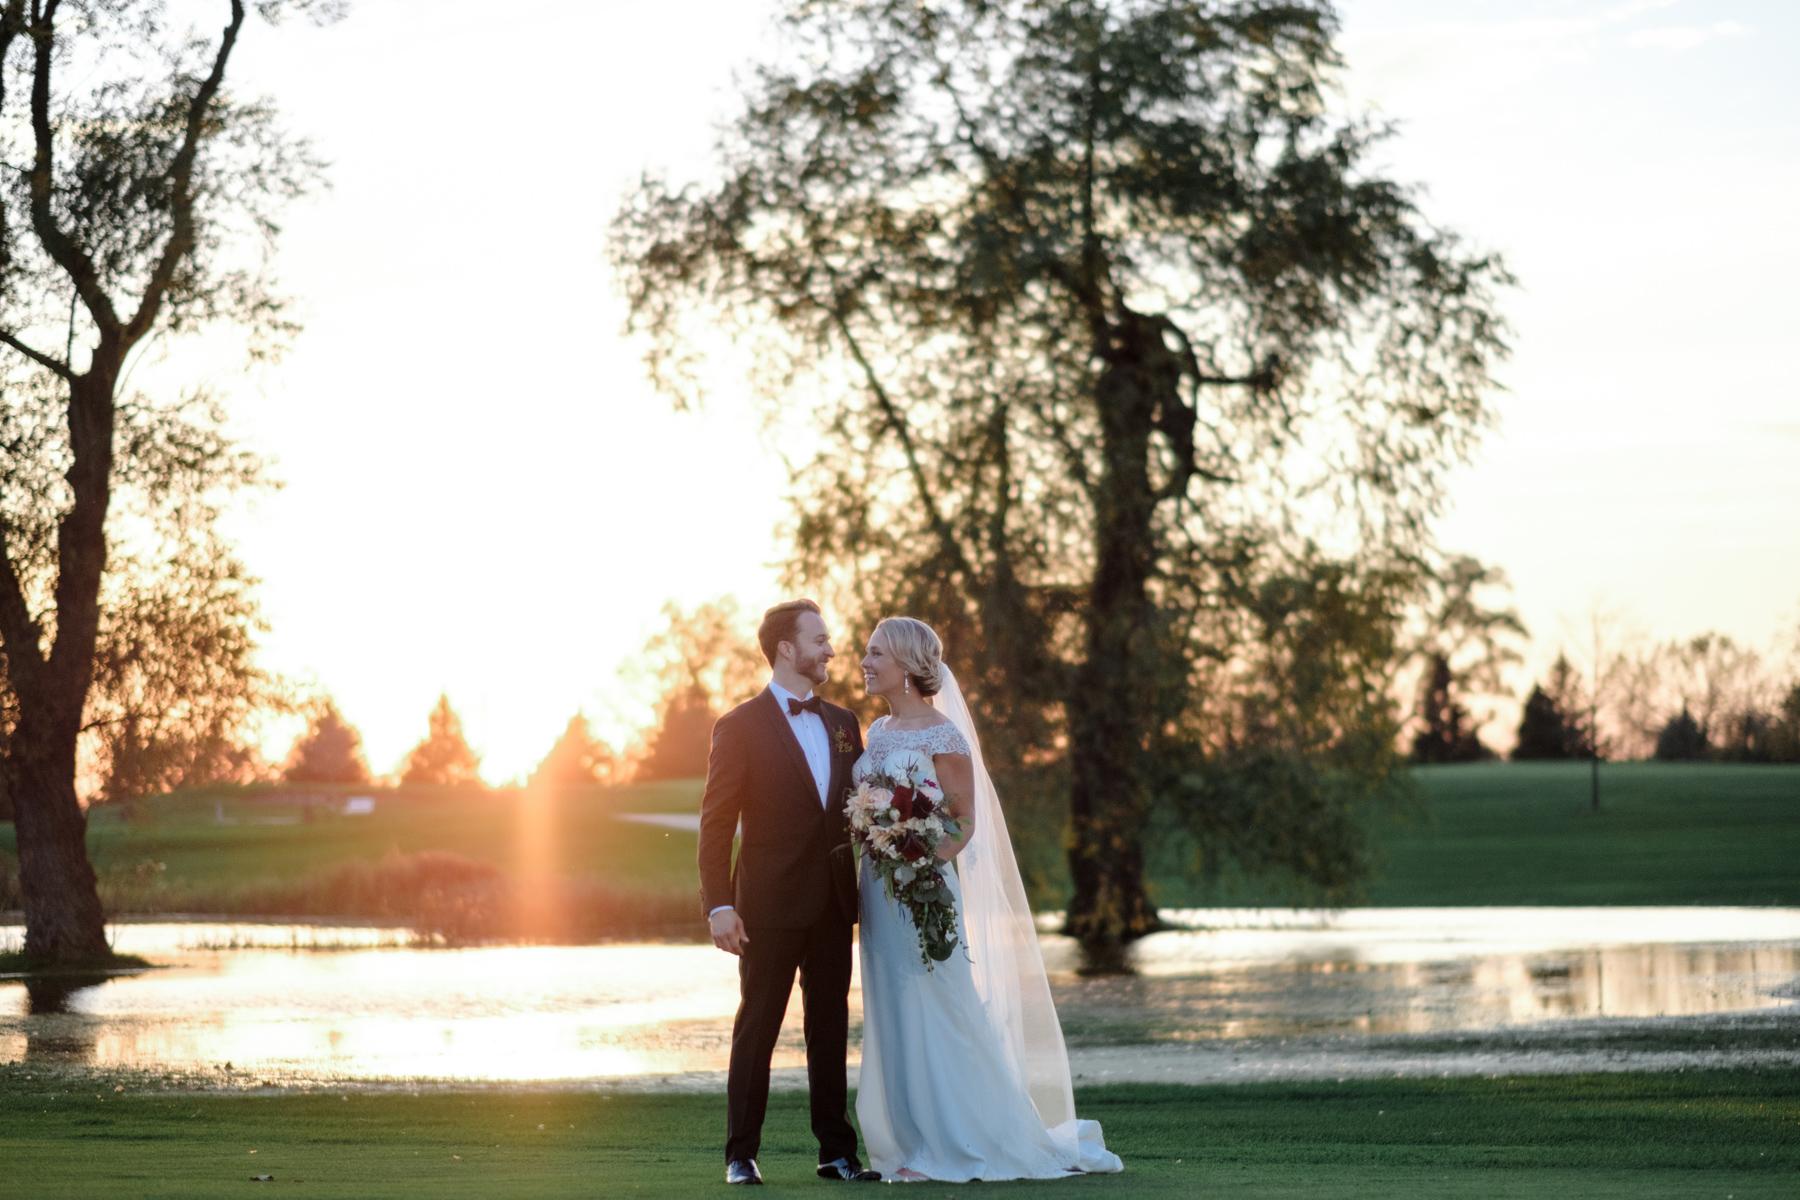 2017_BAP_KalliMatt_Gleneagles_CountryClub_Lemont_Wedding-59.jpg